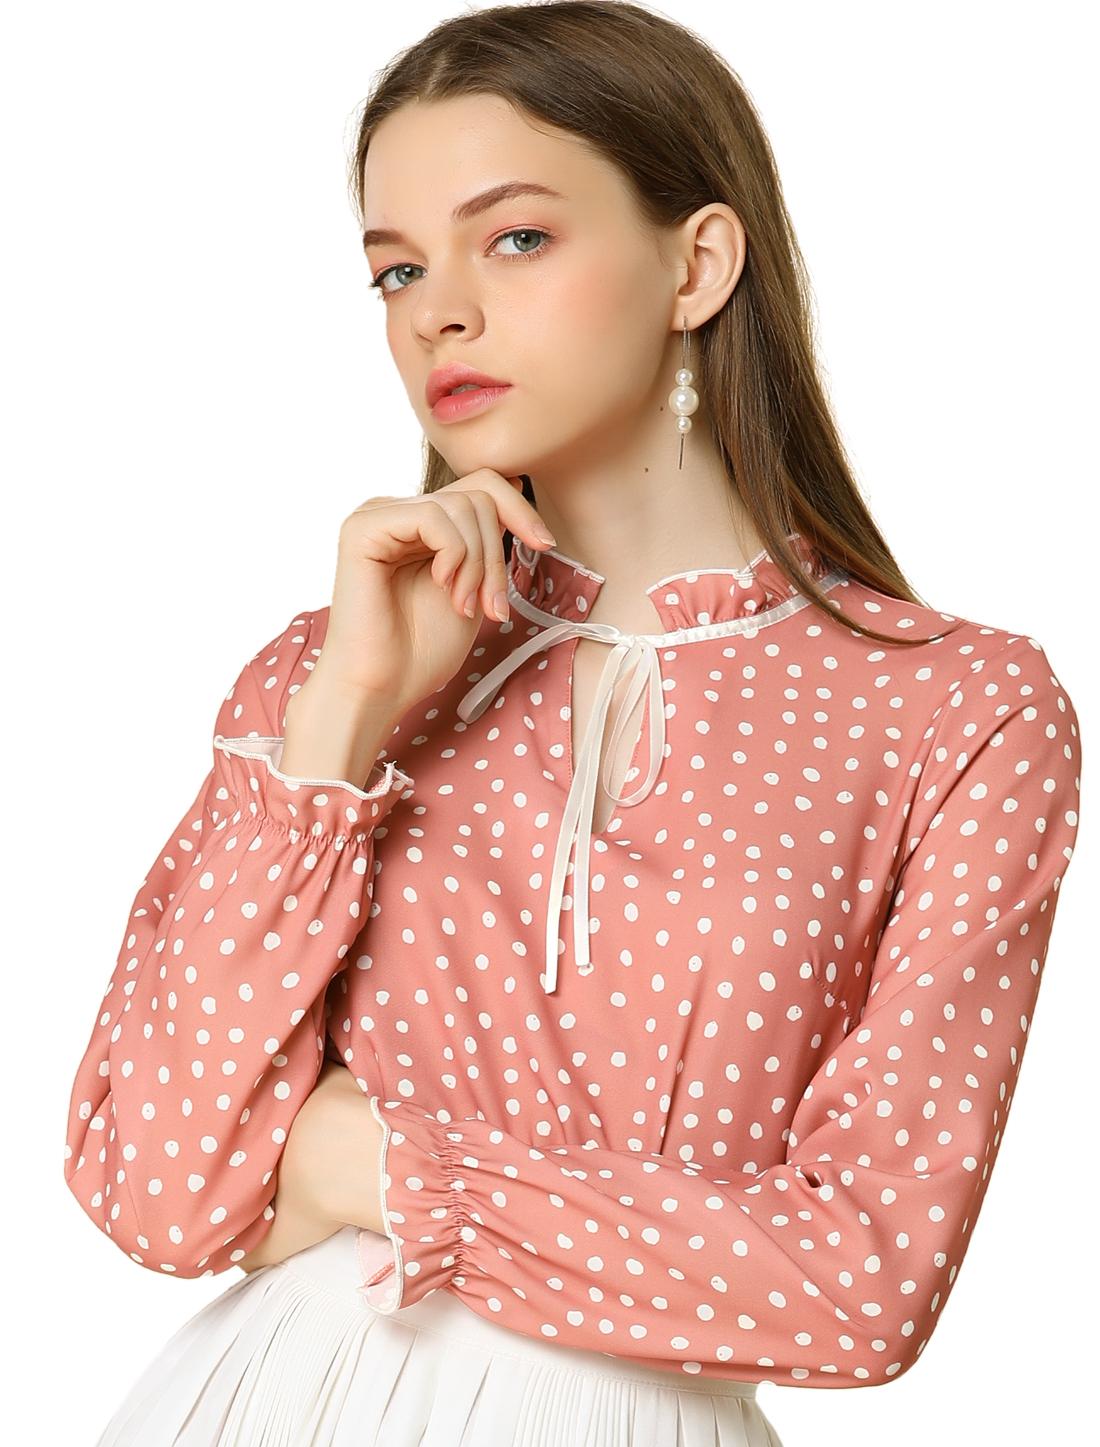 Allegra K Women's Tie Ruffled Neck Polka Dots Blouse Bell Sleeves Tops M